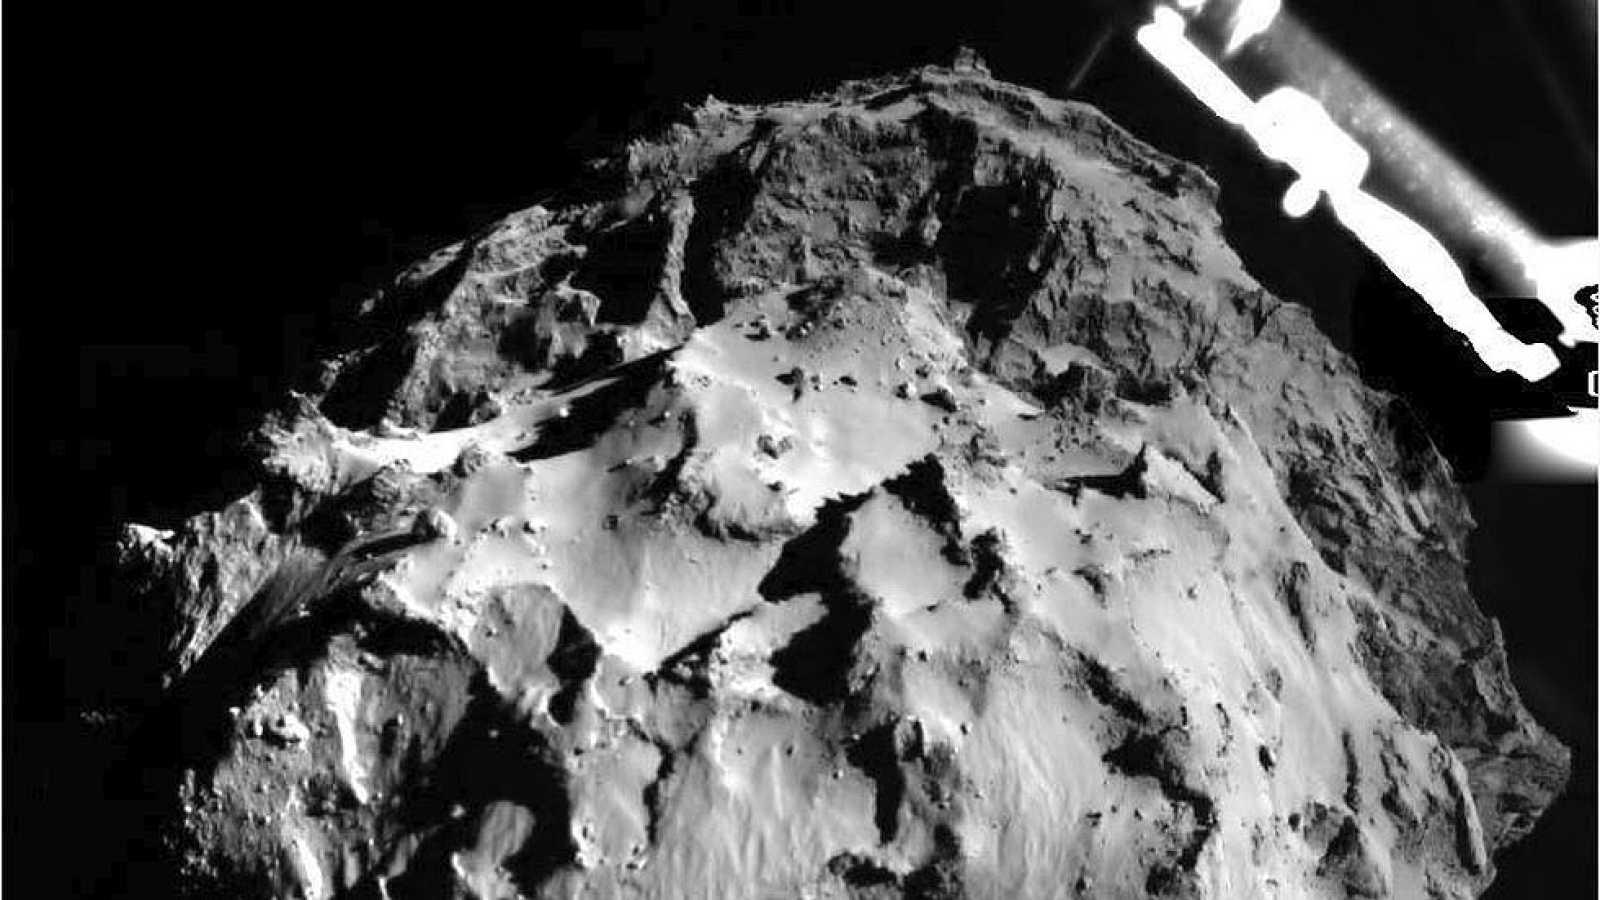 La sonda Philae, de la misión Roseta, aterriza sobre el cometa 67P